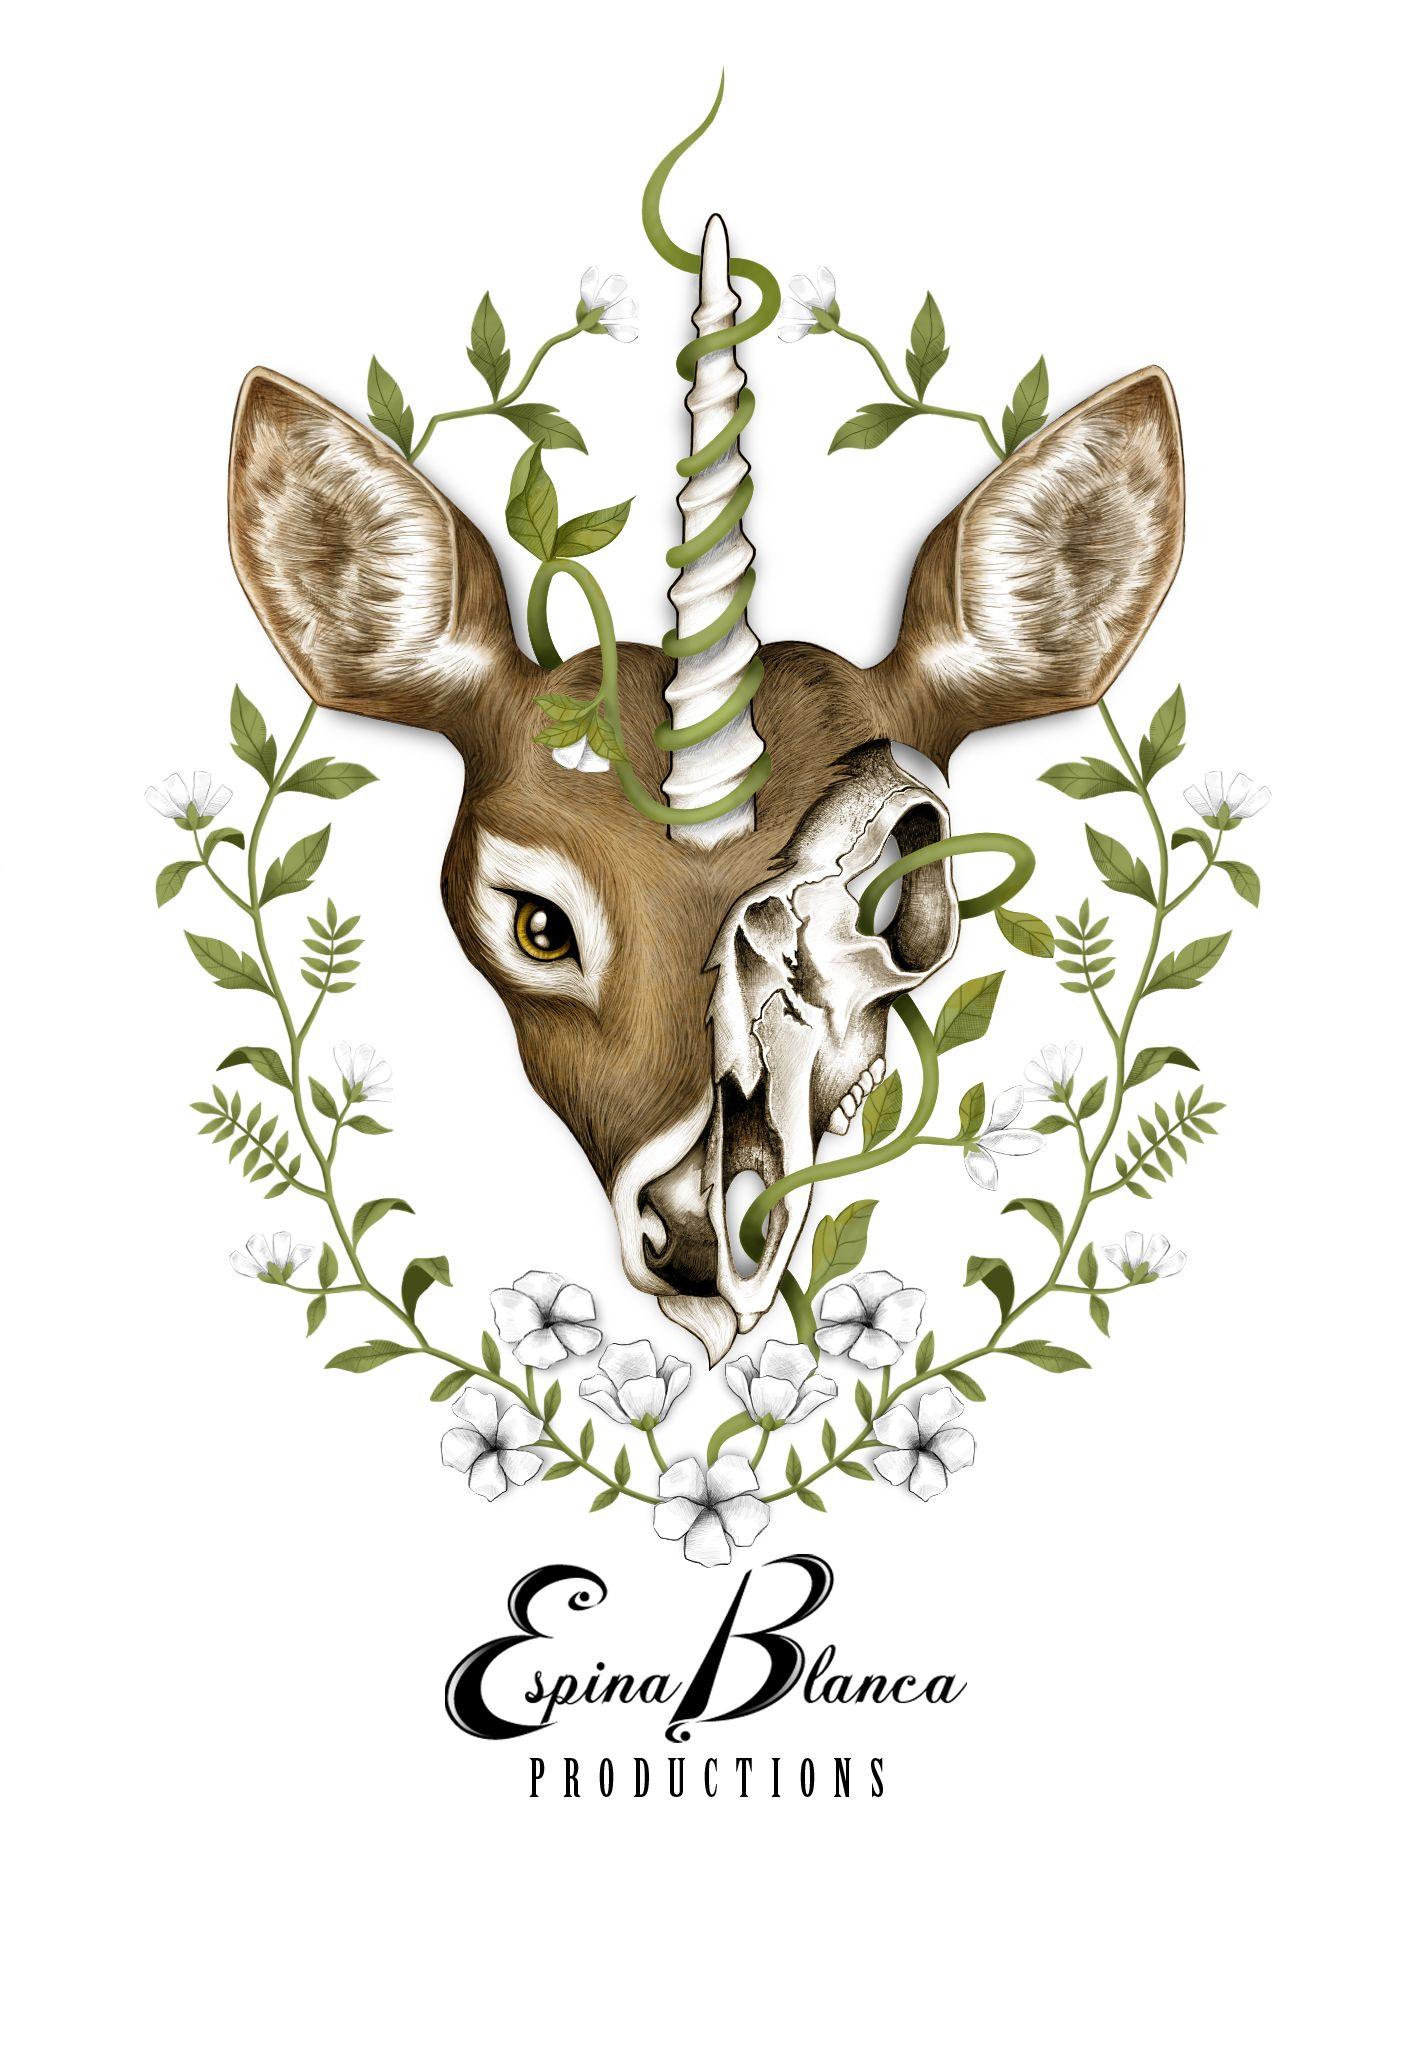 Espina Blanca Productions